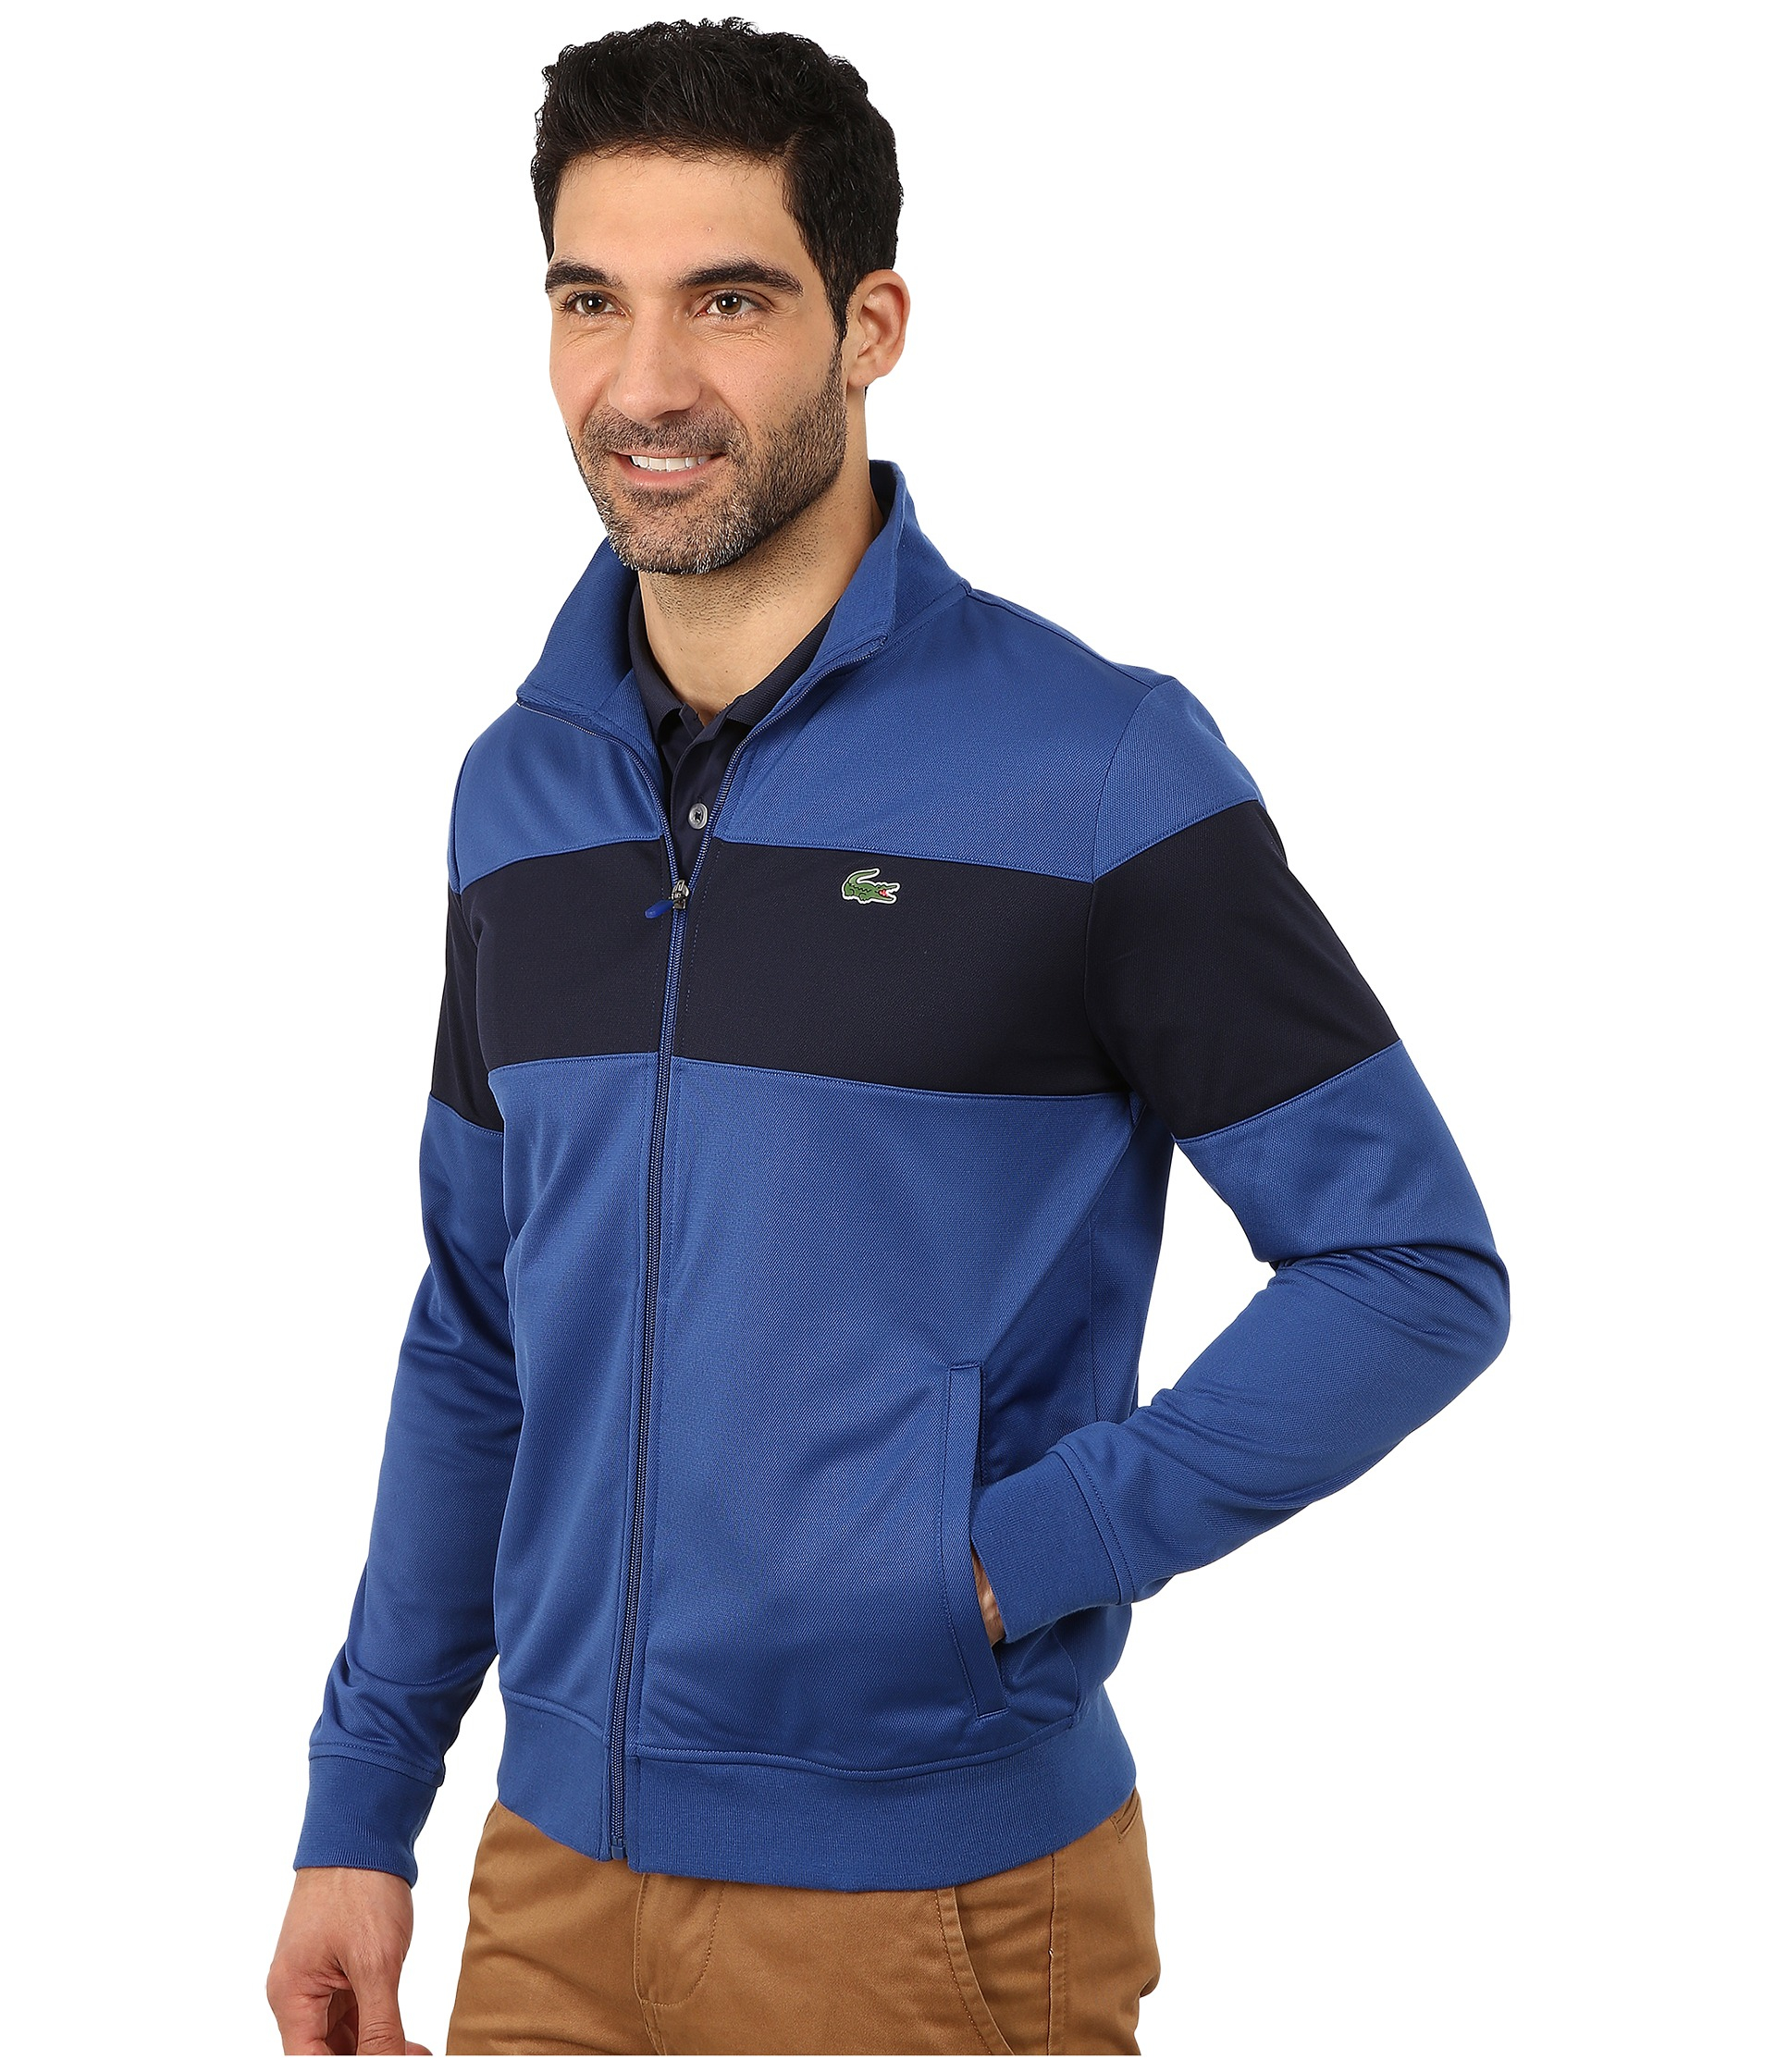 lacoste sport track jacket with bold chest stripe in blue. Black Bedroom Furniture Sets. Home Design Ideas